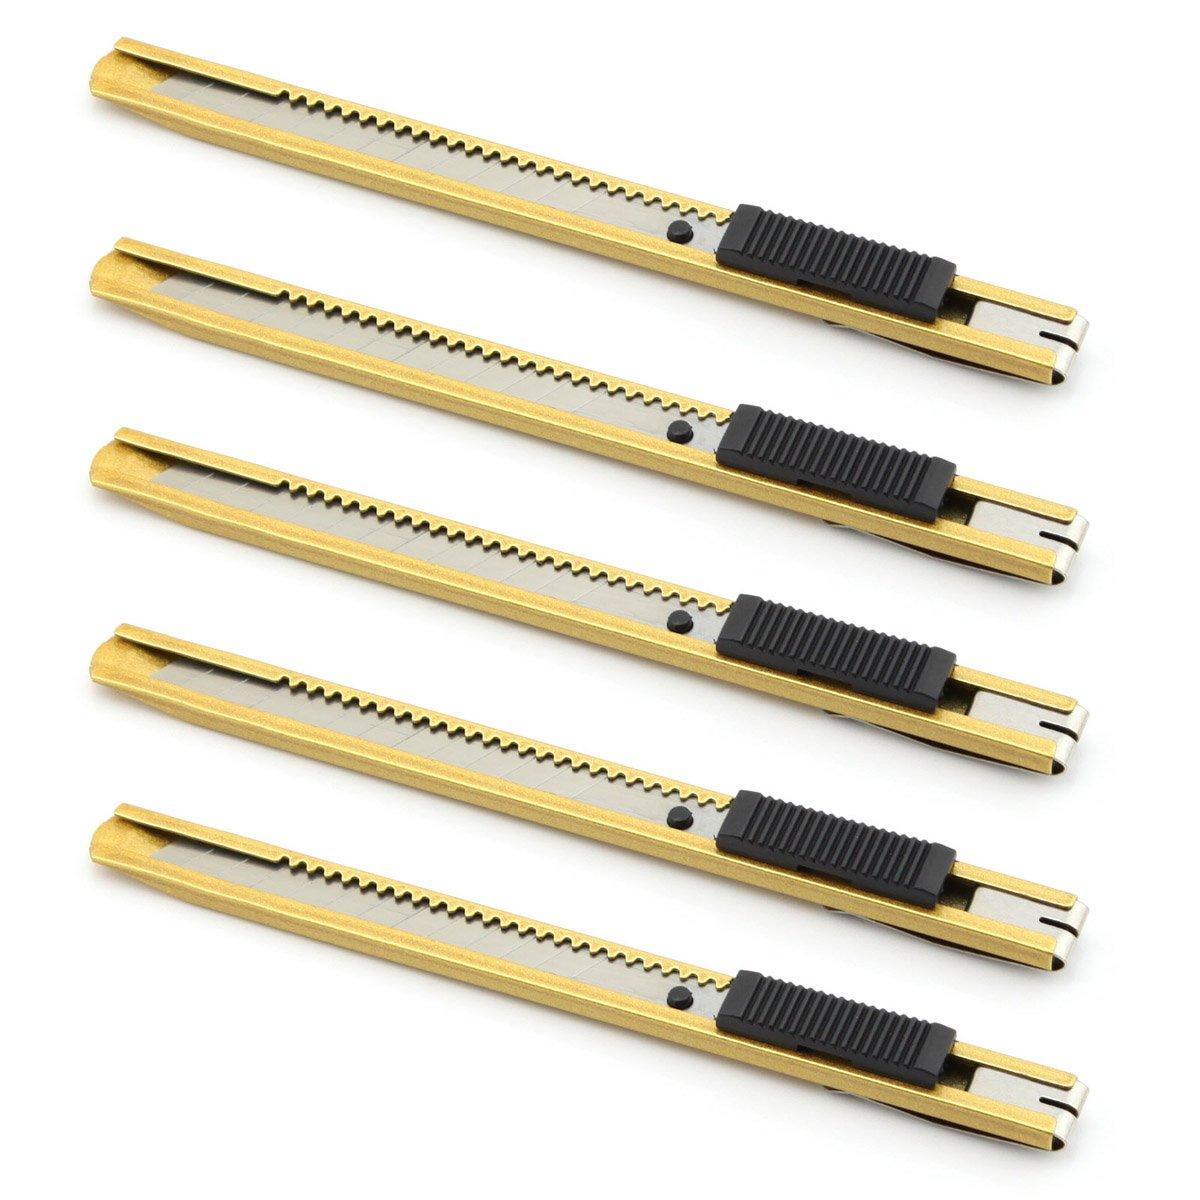 Owfeel Pack of 5 Pcs 9mm Aluminum Auto-lock Utility Knife Box Cutter Golden